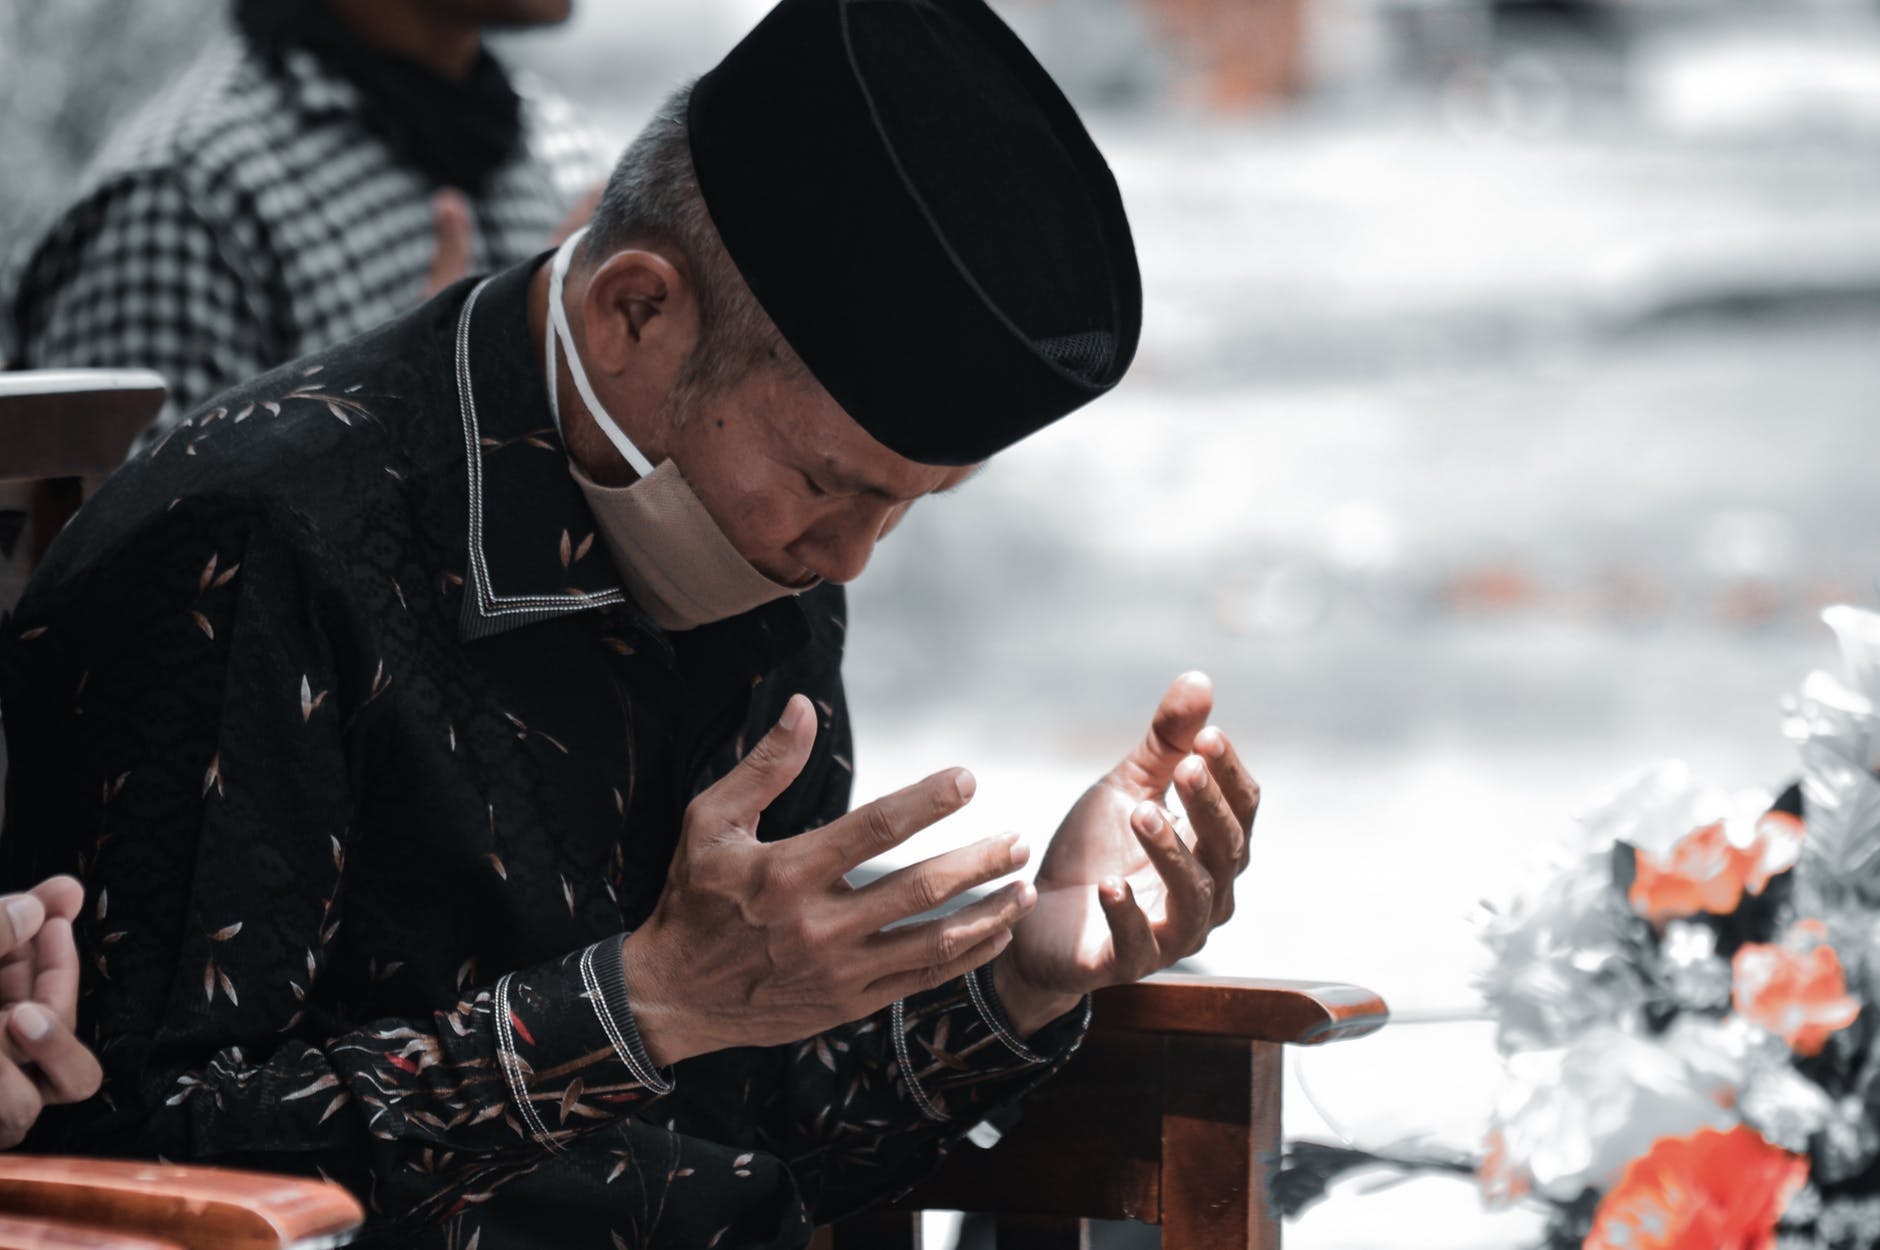 7 Amalan Sunnah Saat Berbuka Puasa Ramadhan - katalogue.id